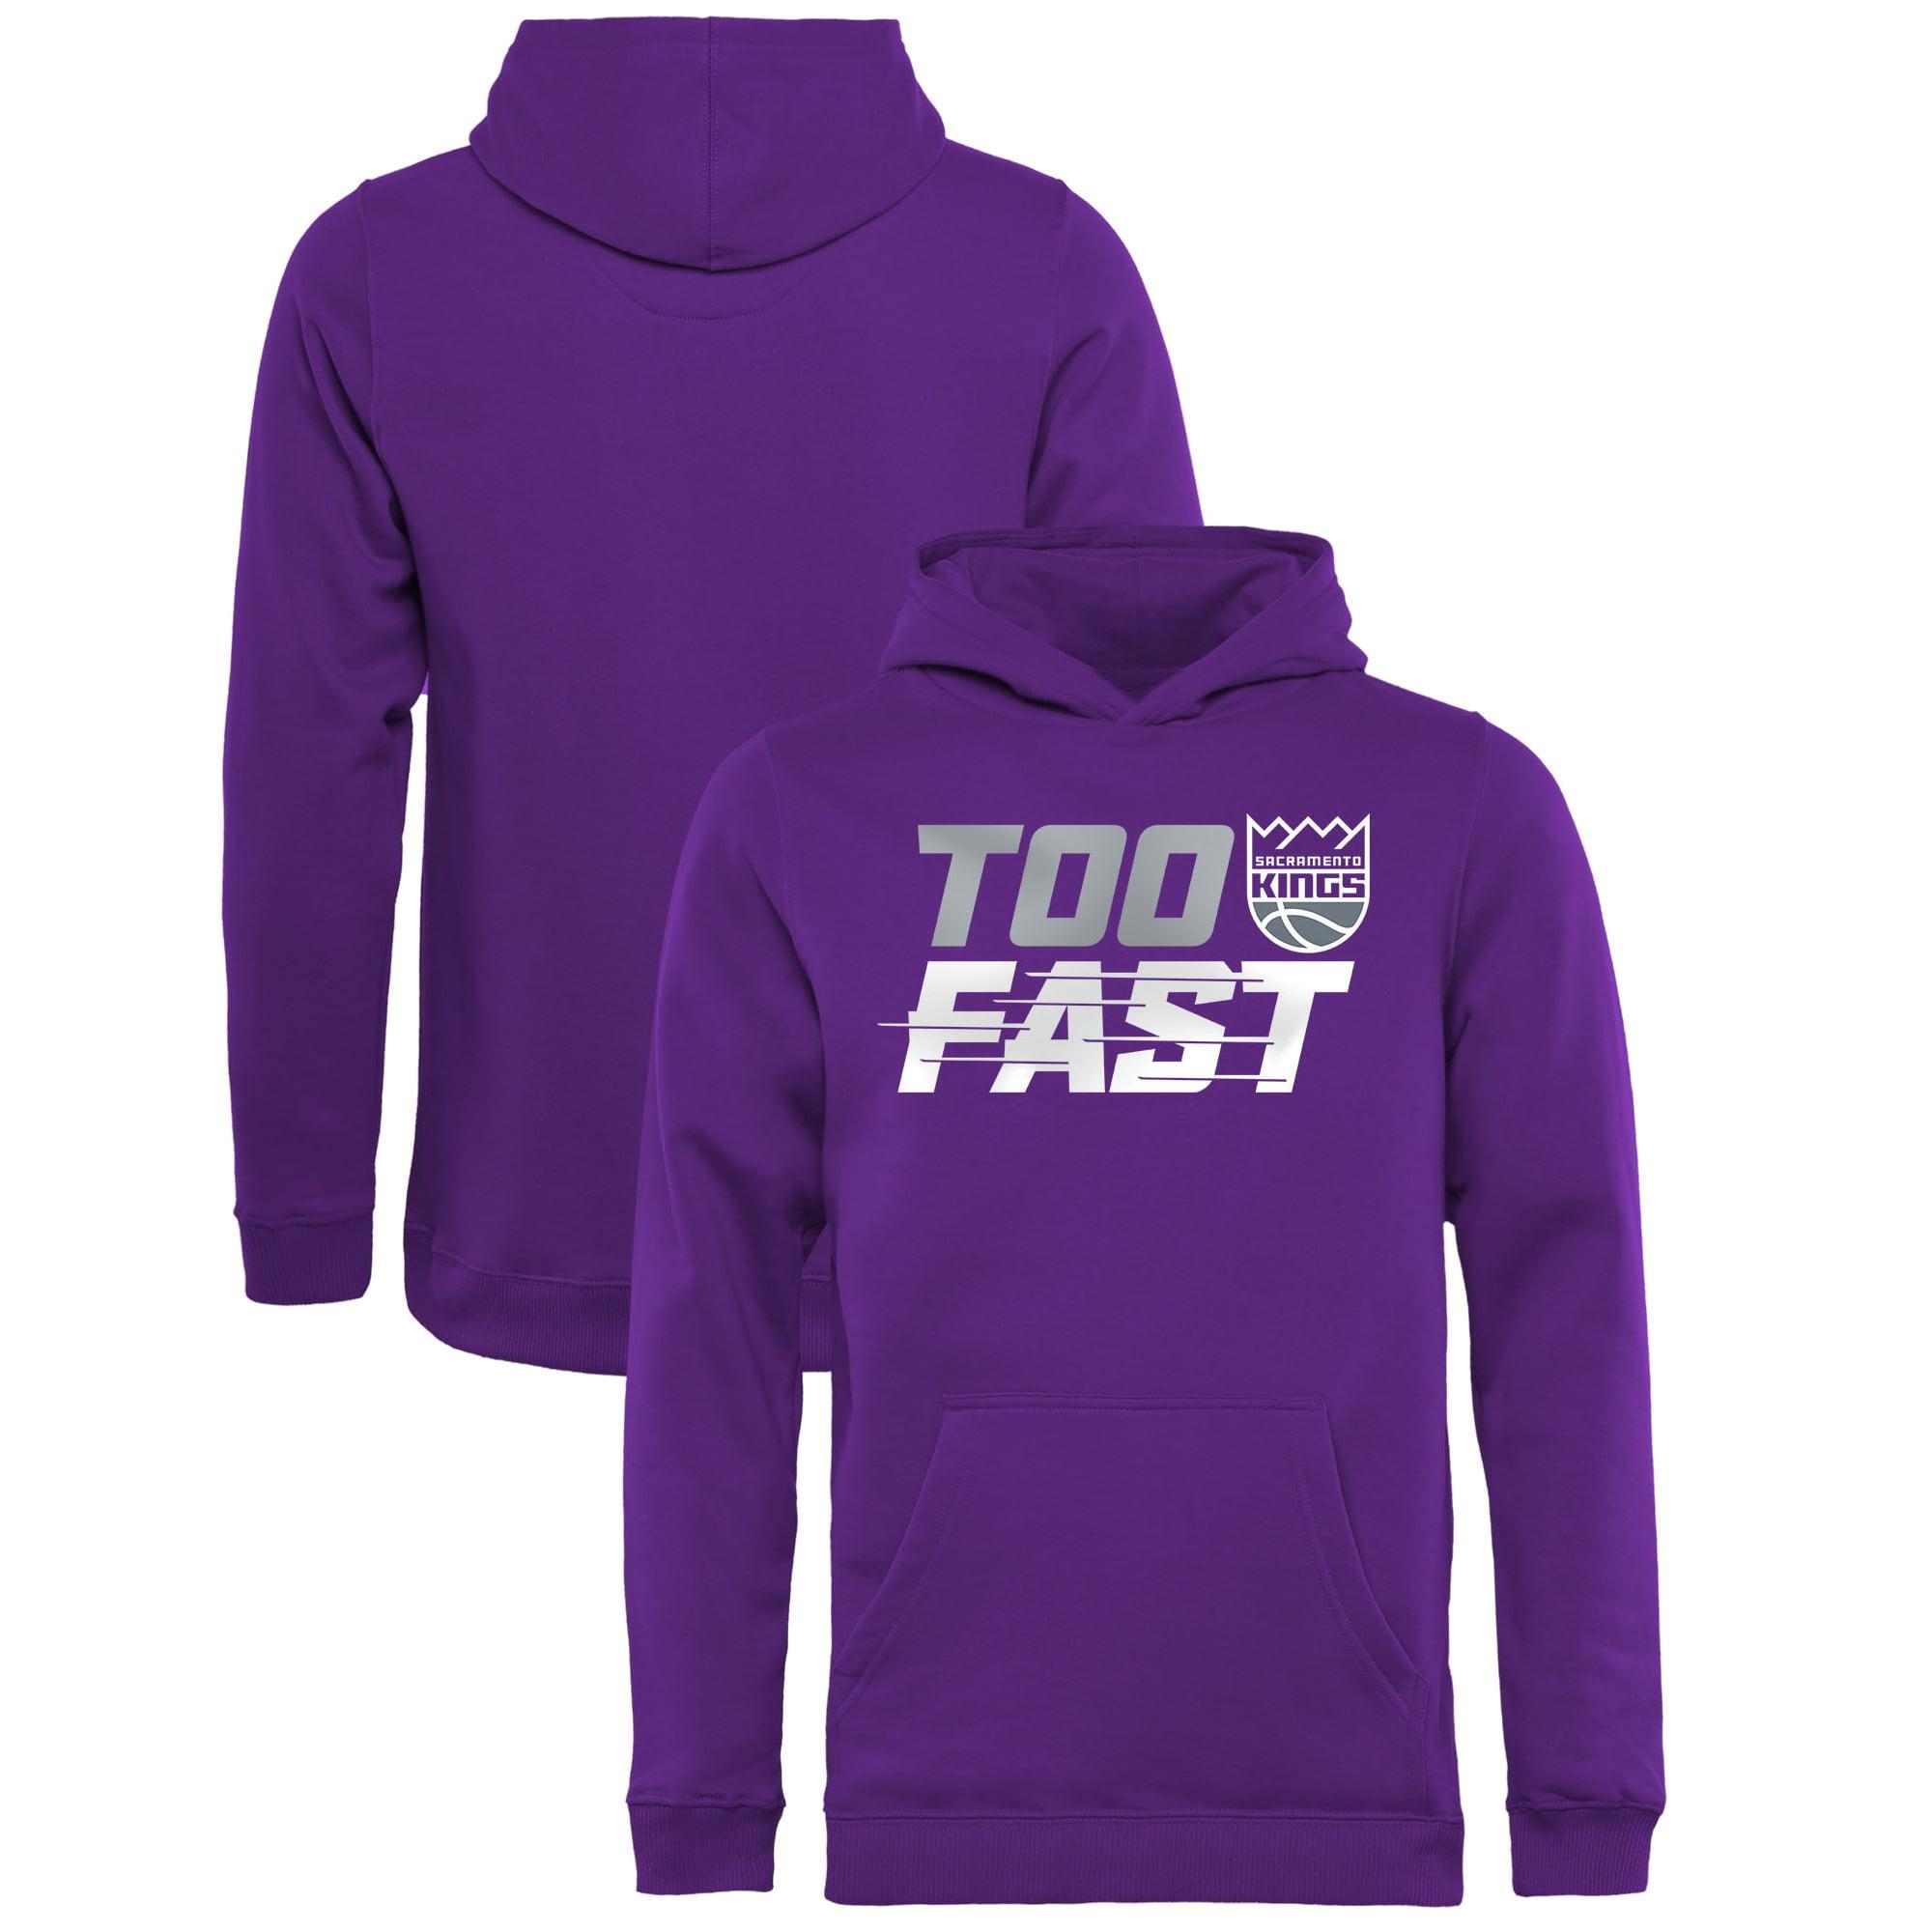 Sacramento Kings Fanatics Branded Youth Too Fast Pullover Hoodie - Purple